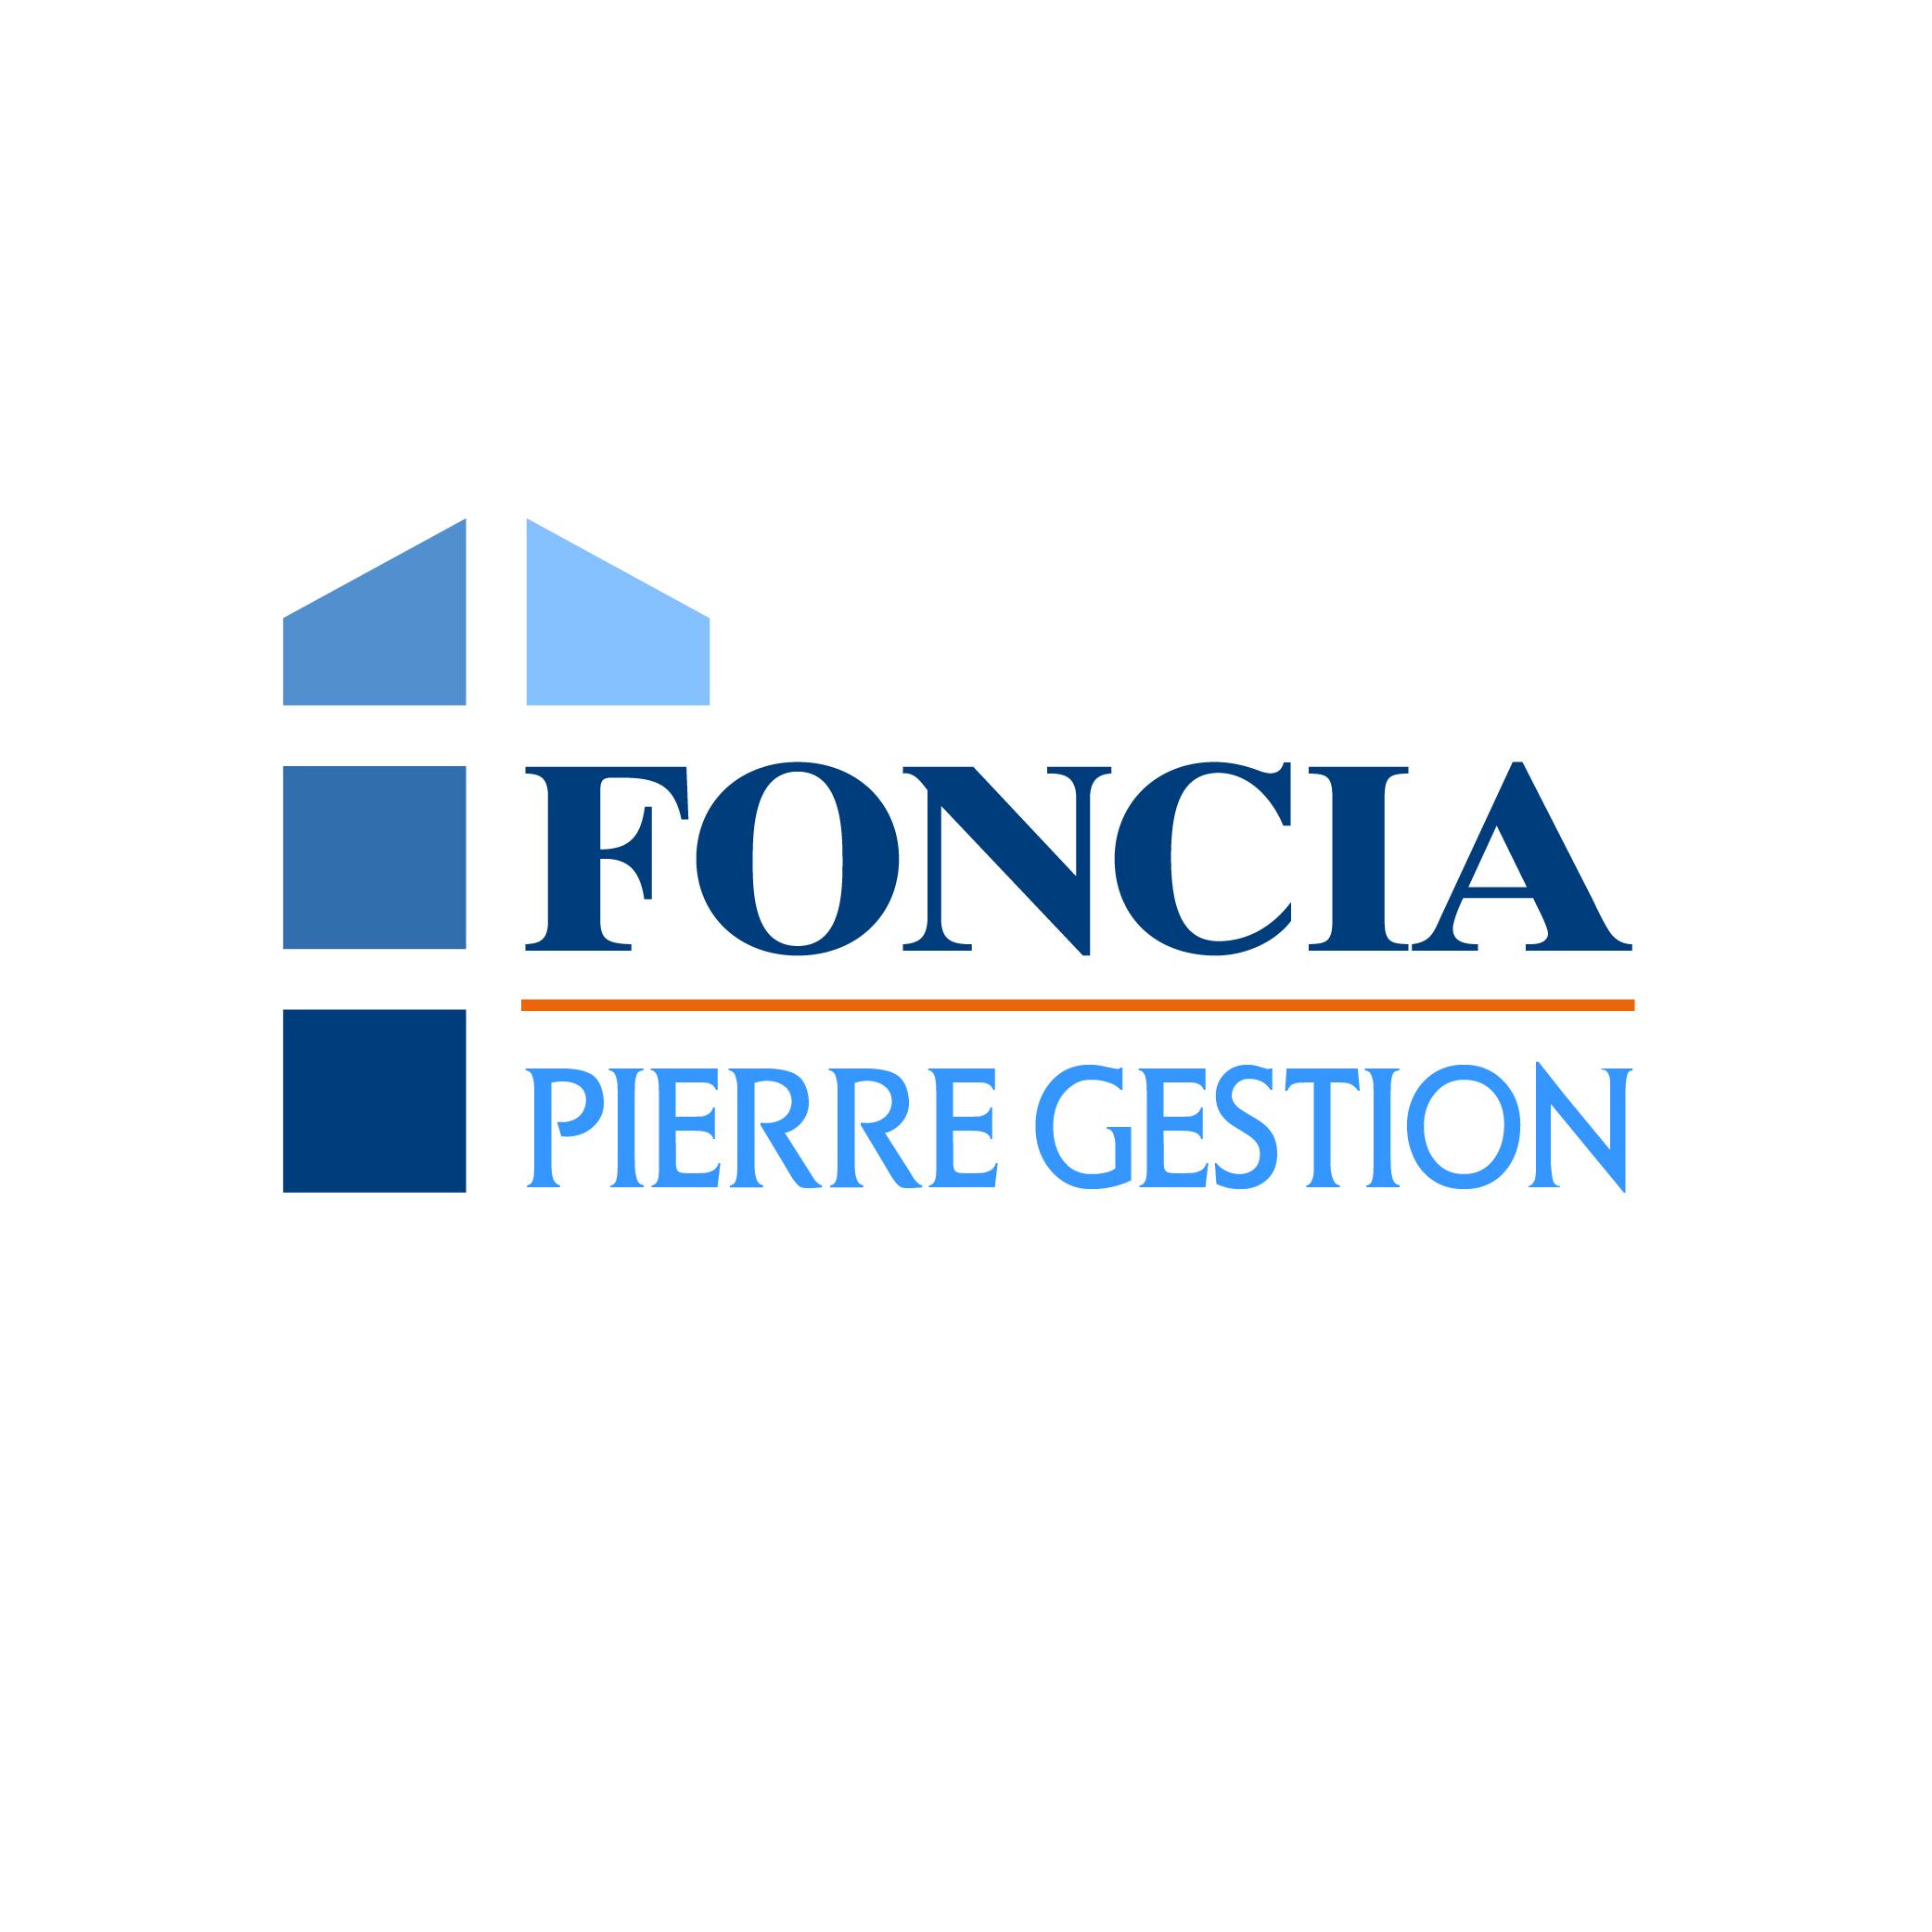 Foncia Pierre Gestion